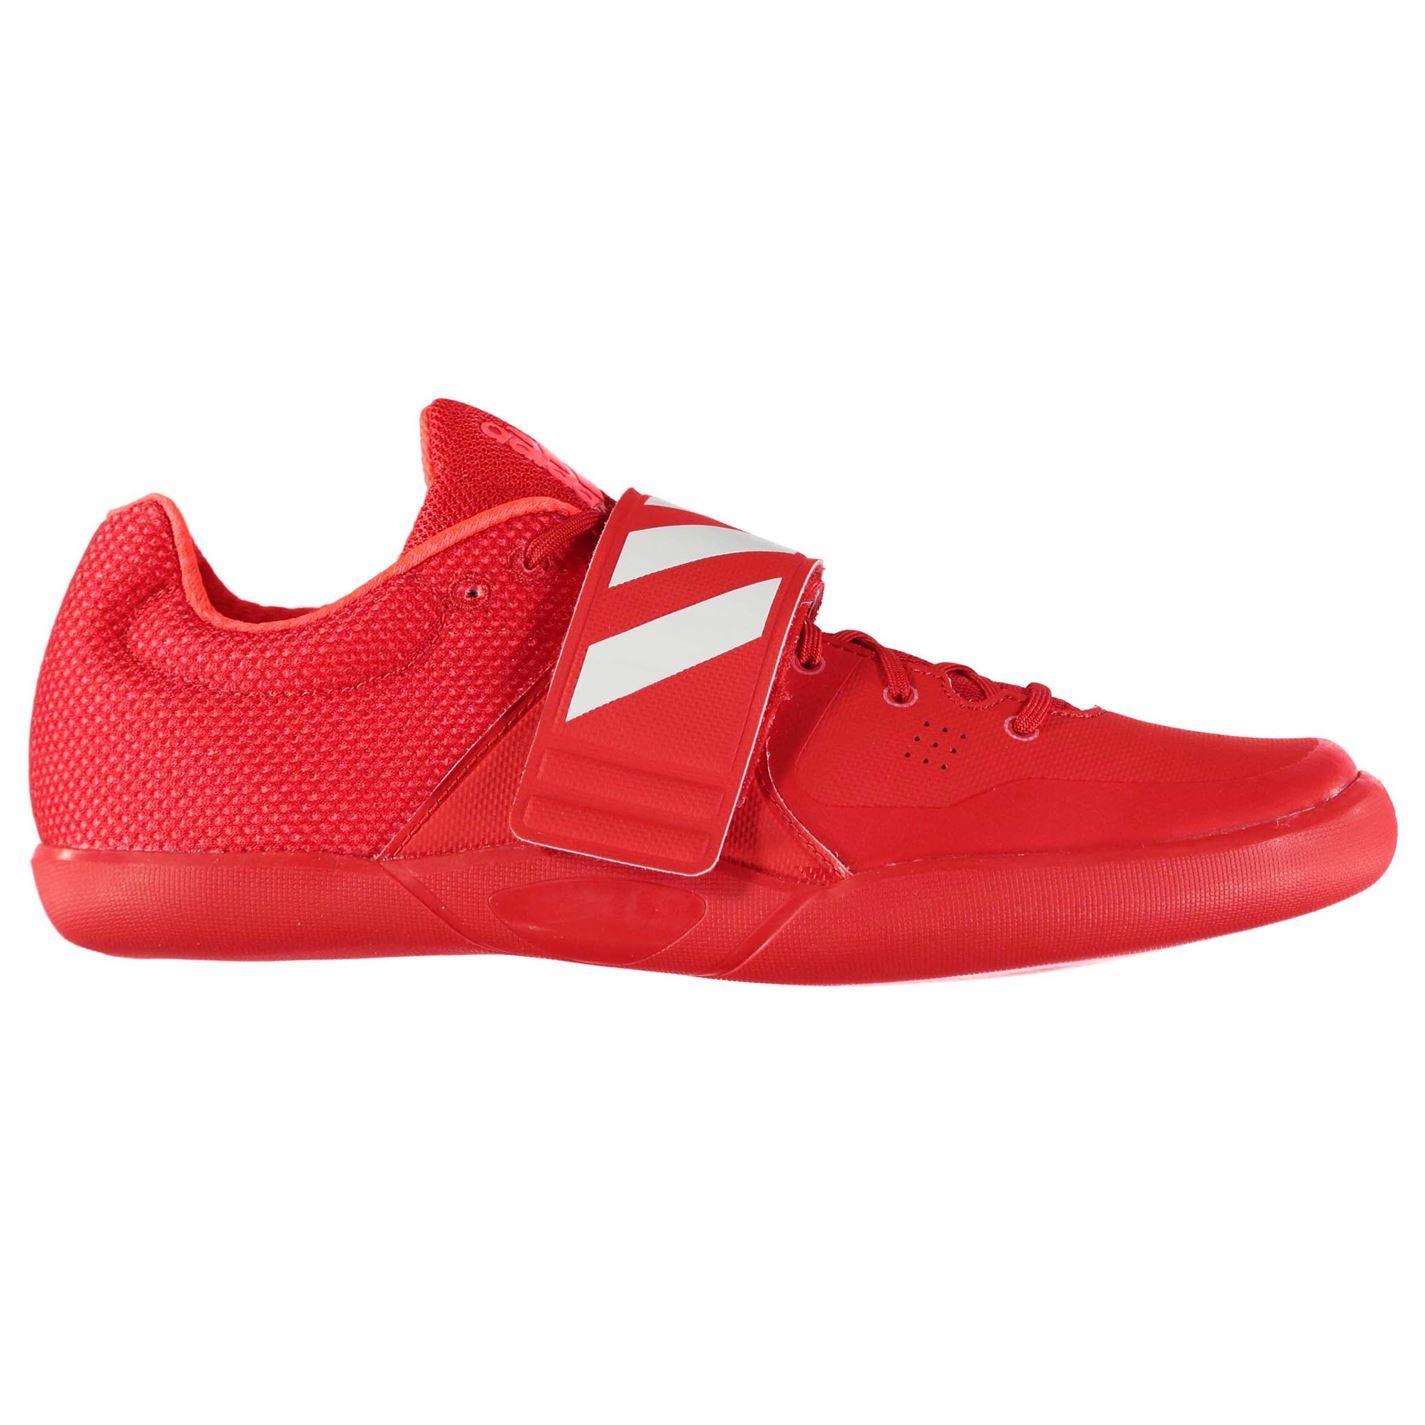 adidas Mens adizero Discus Hammer Running Shoes Trainers ...